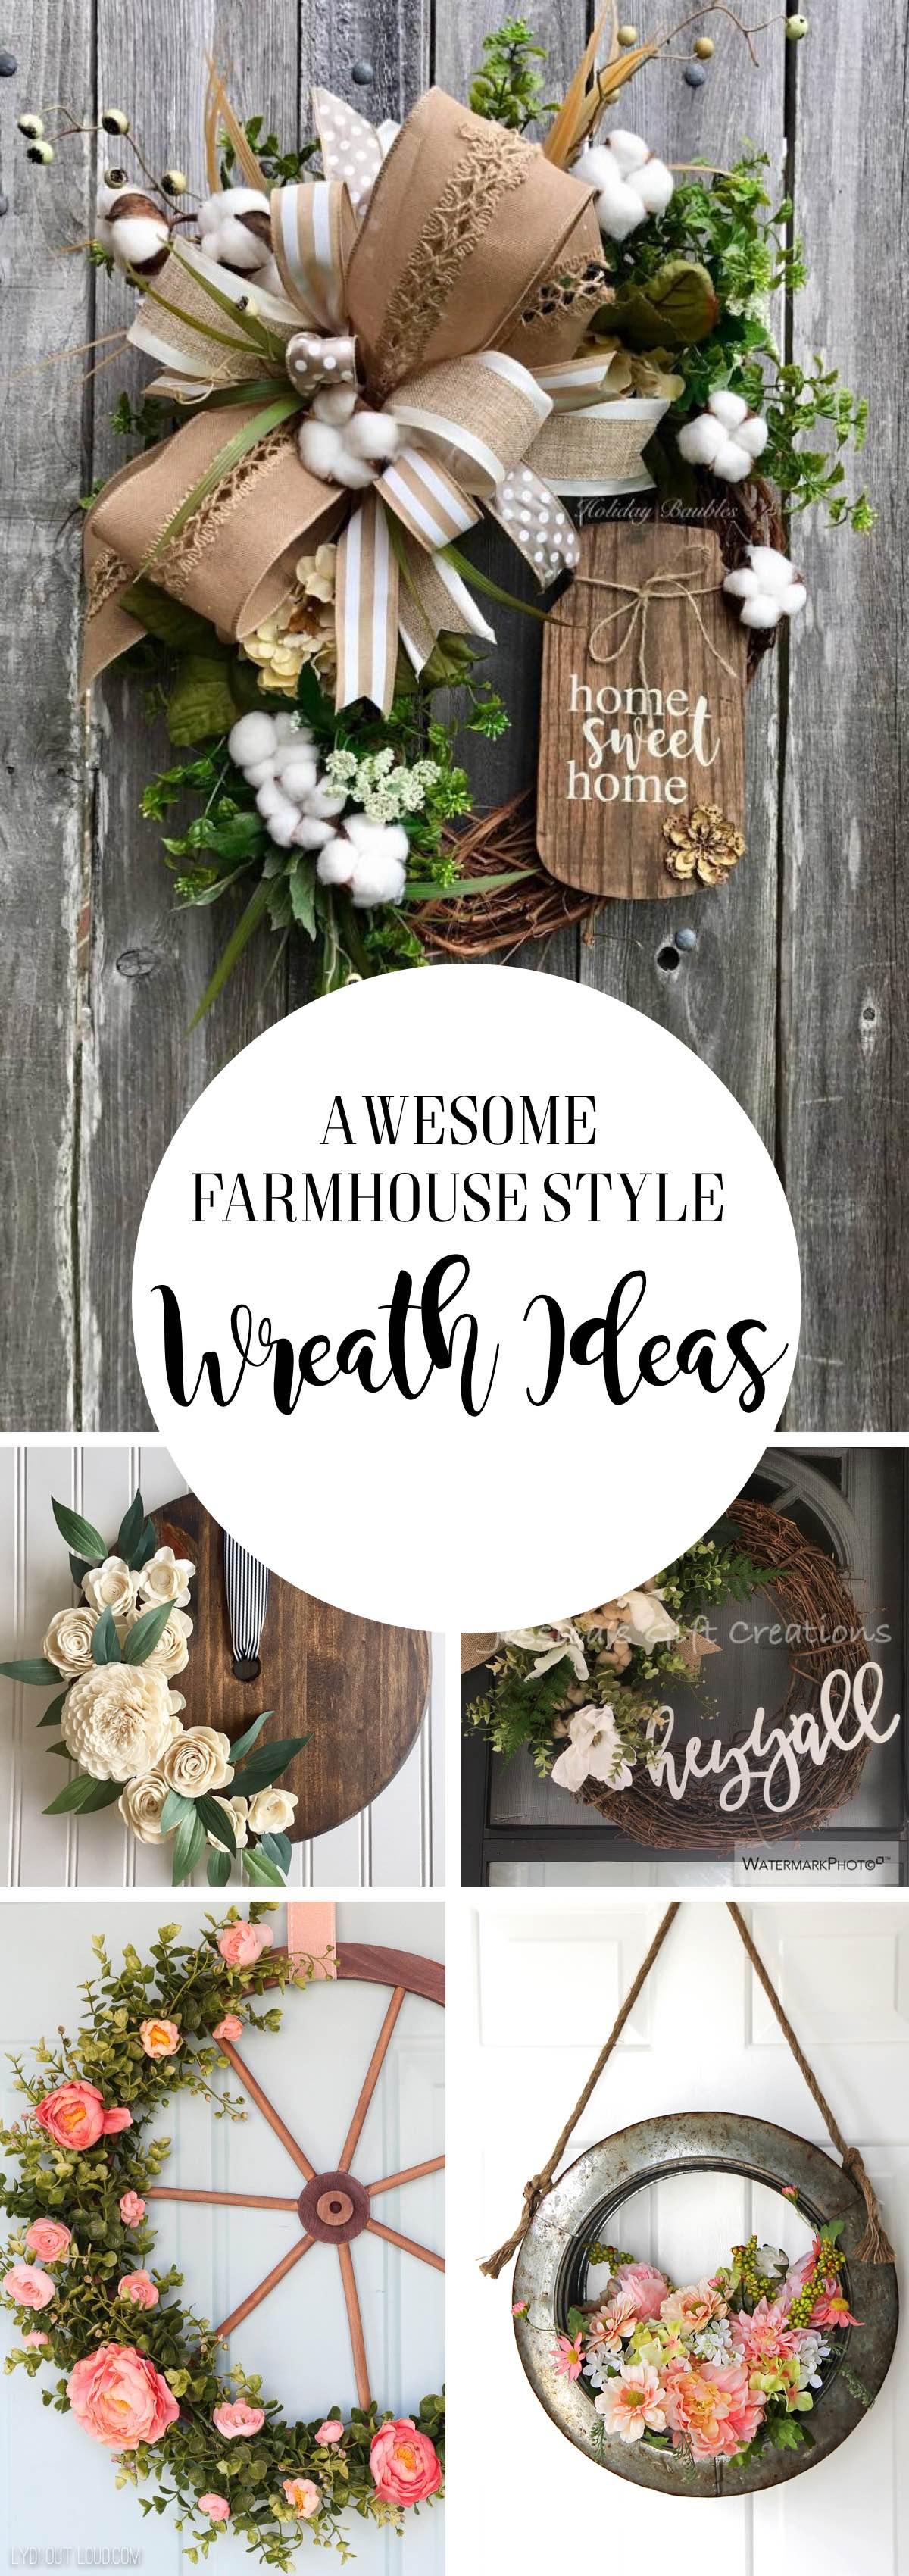 Awesome Farmhouse Style Wreath Ideas